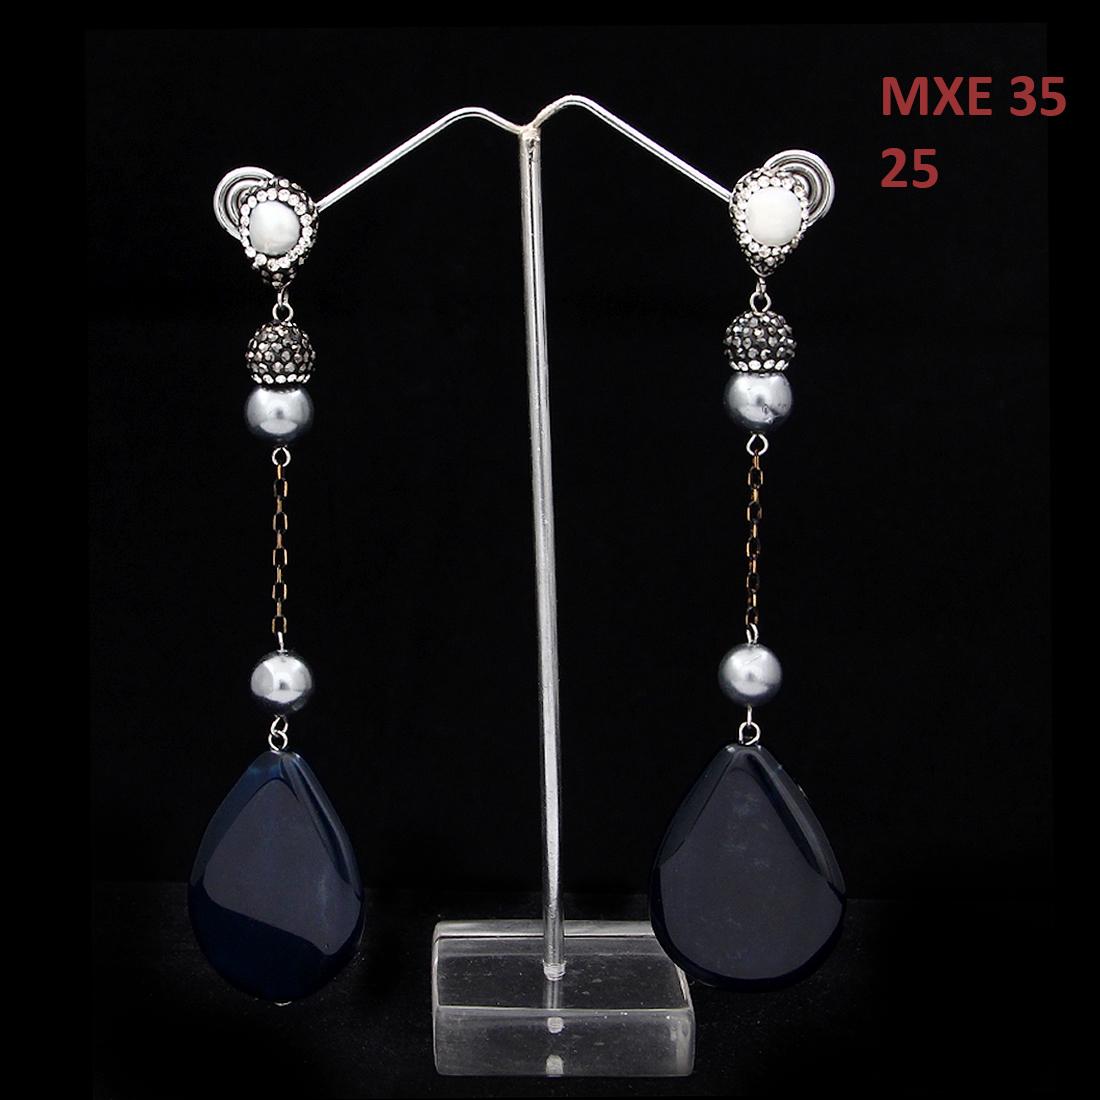 55Carat | 55Carat Fashion Long Tassle Drop Earrings Oxidized Silver Cubic Zircon, Pearl, Jasper Blue Exclusive Latest Designer Collection Dangling Earrings Jewellery for Women and Girls